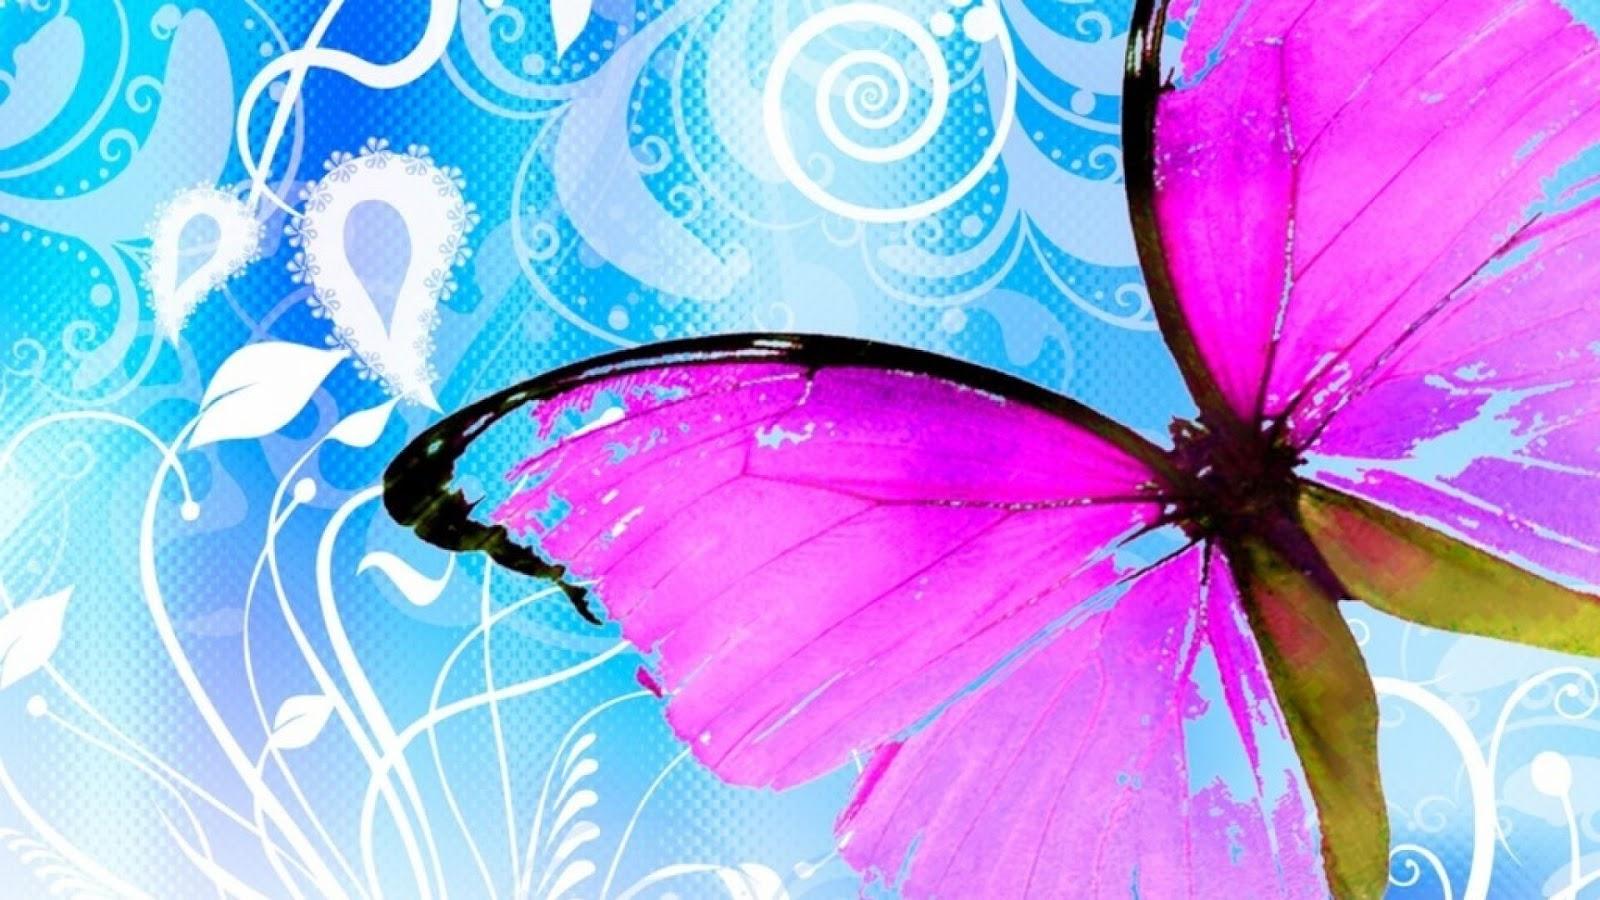 Fondos para whatsapp patada de caballo mariposas for Imagenes fondo escritorio